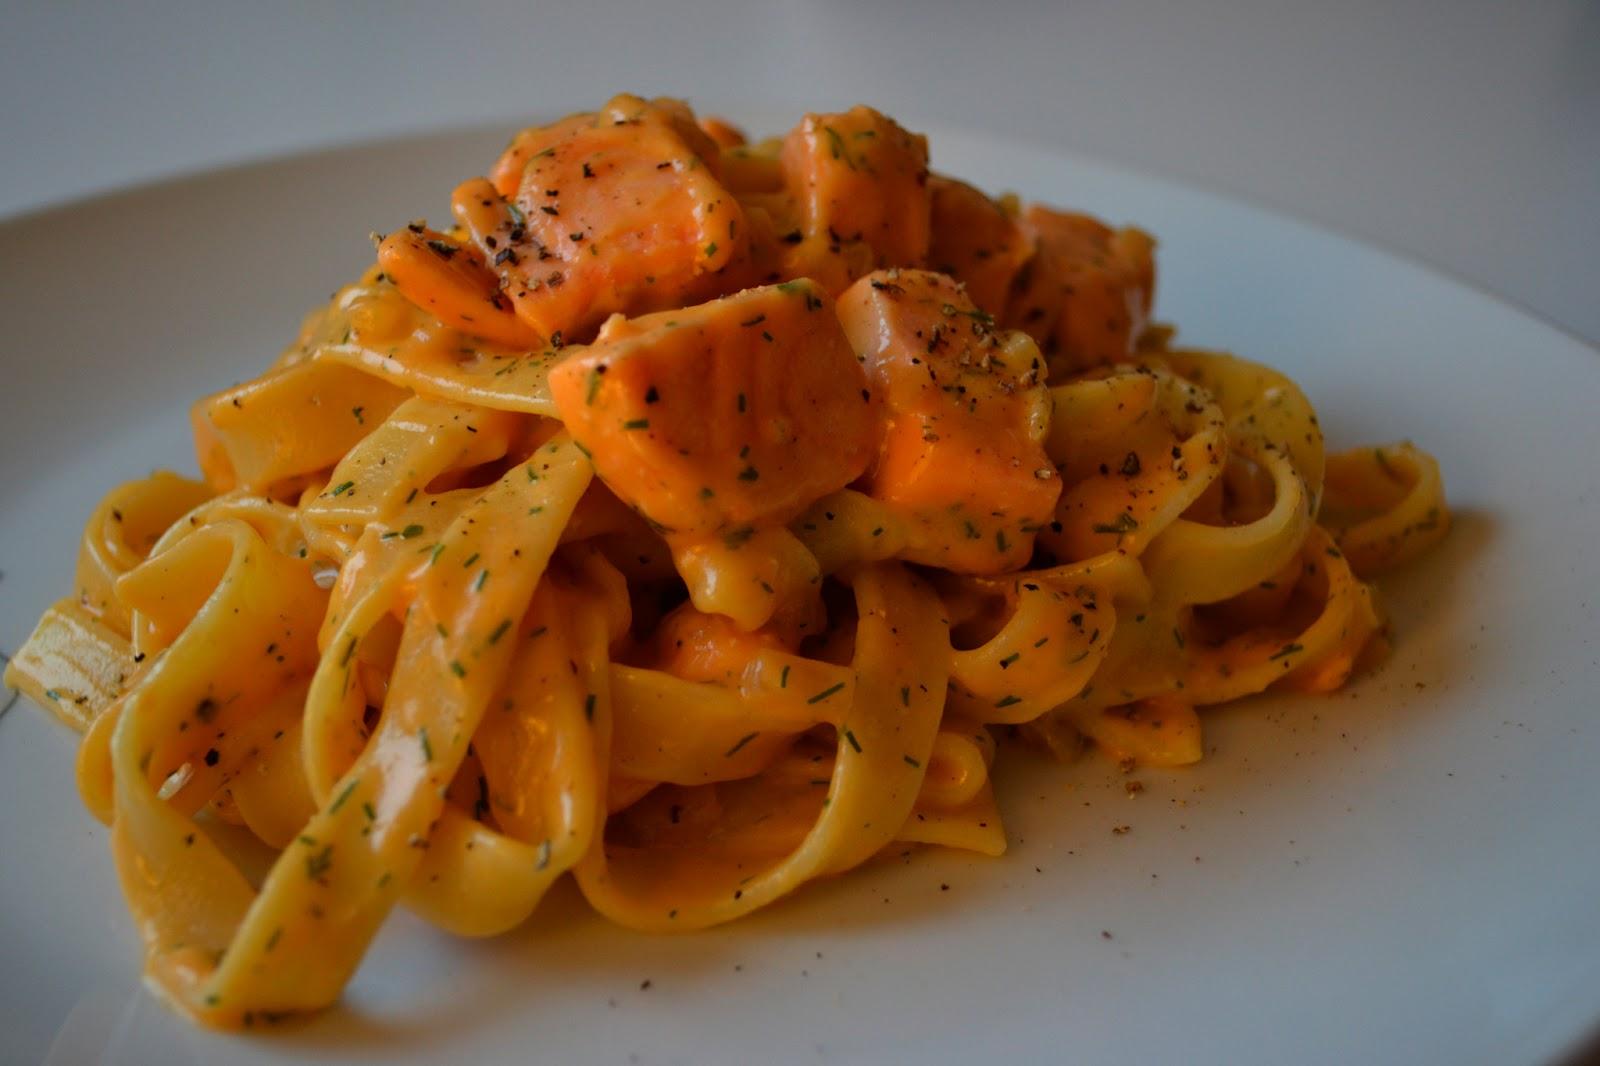 italienischer brotsalat jamie oliver